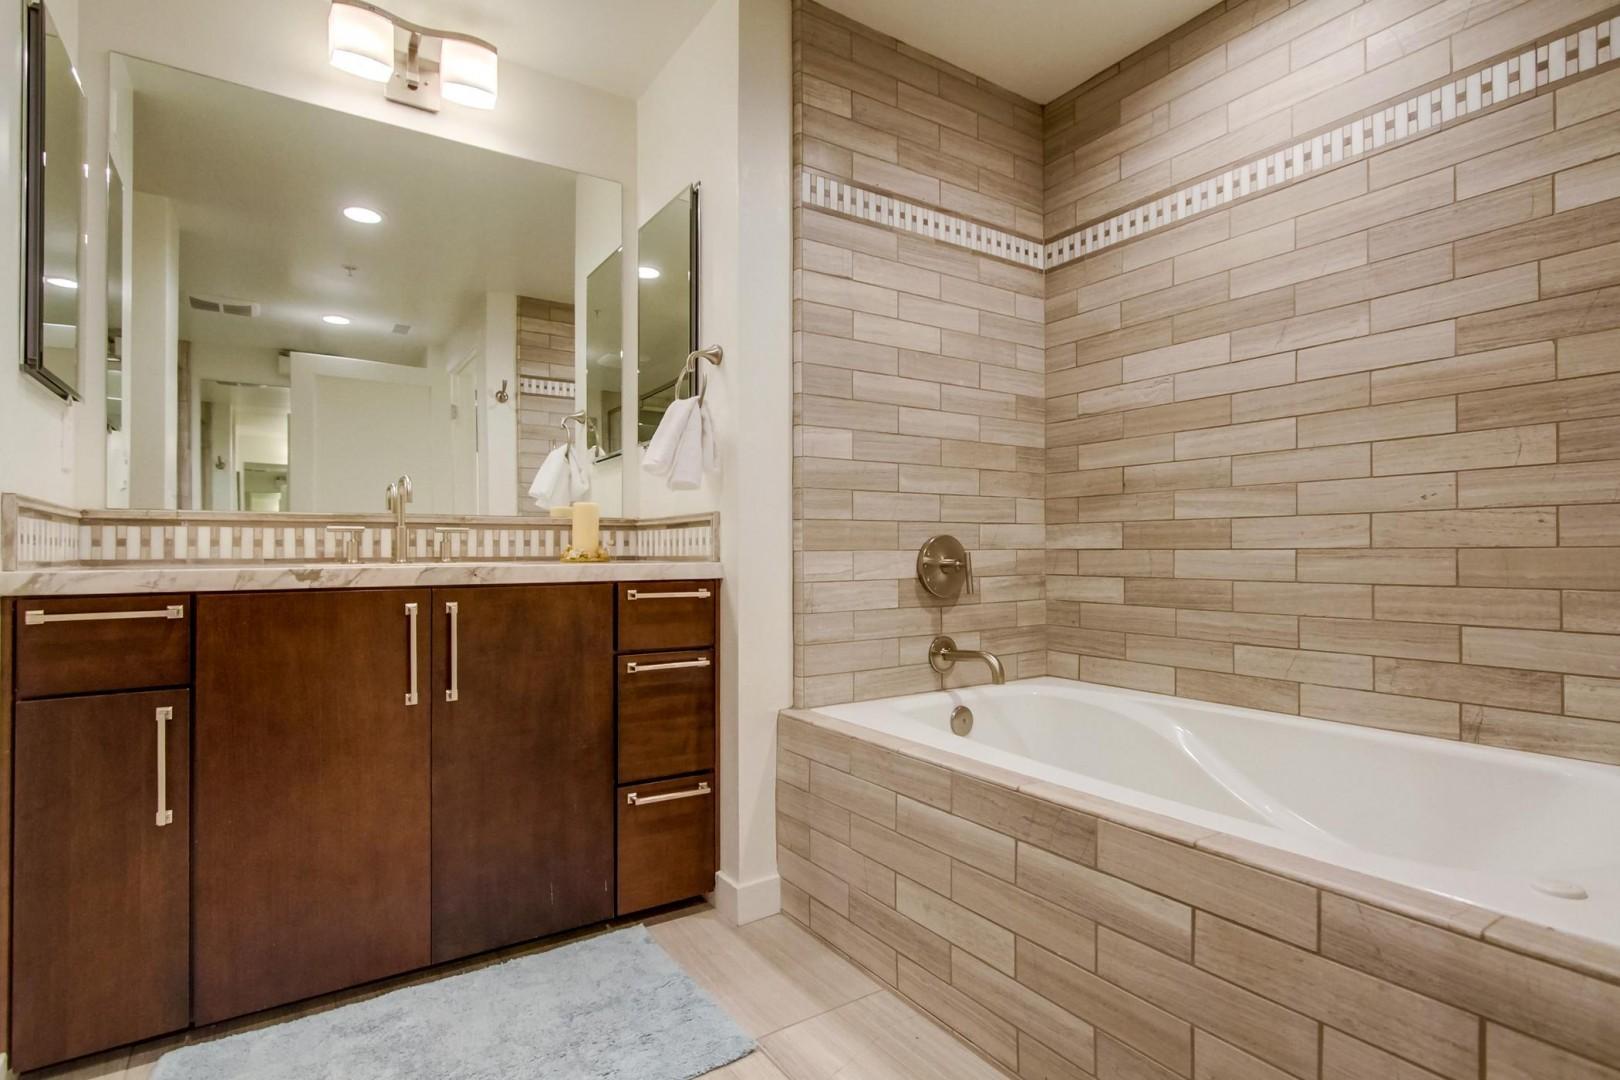 Soaking tub in the master bathroom